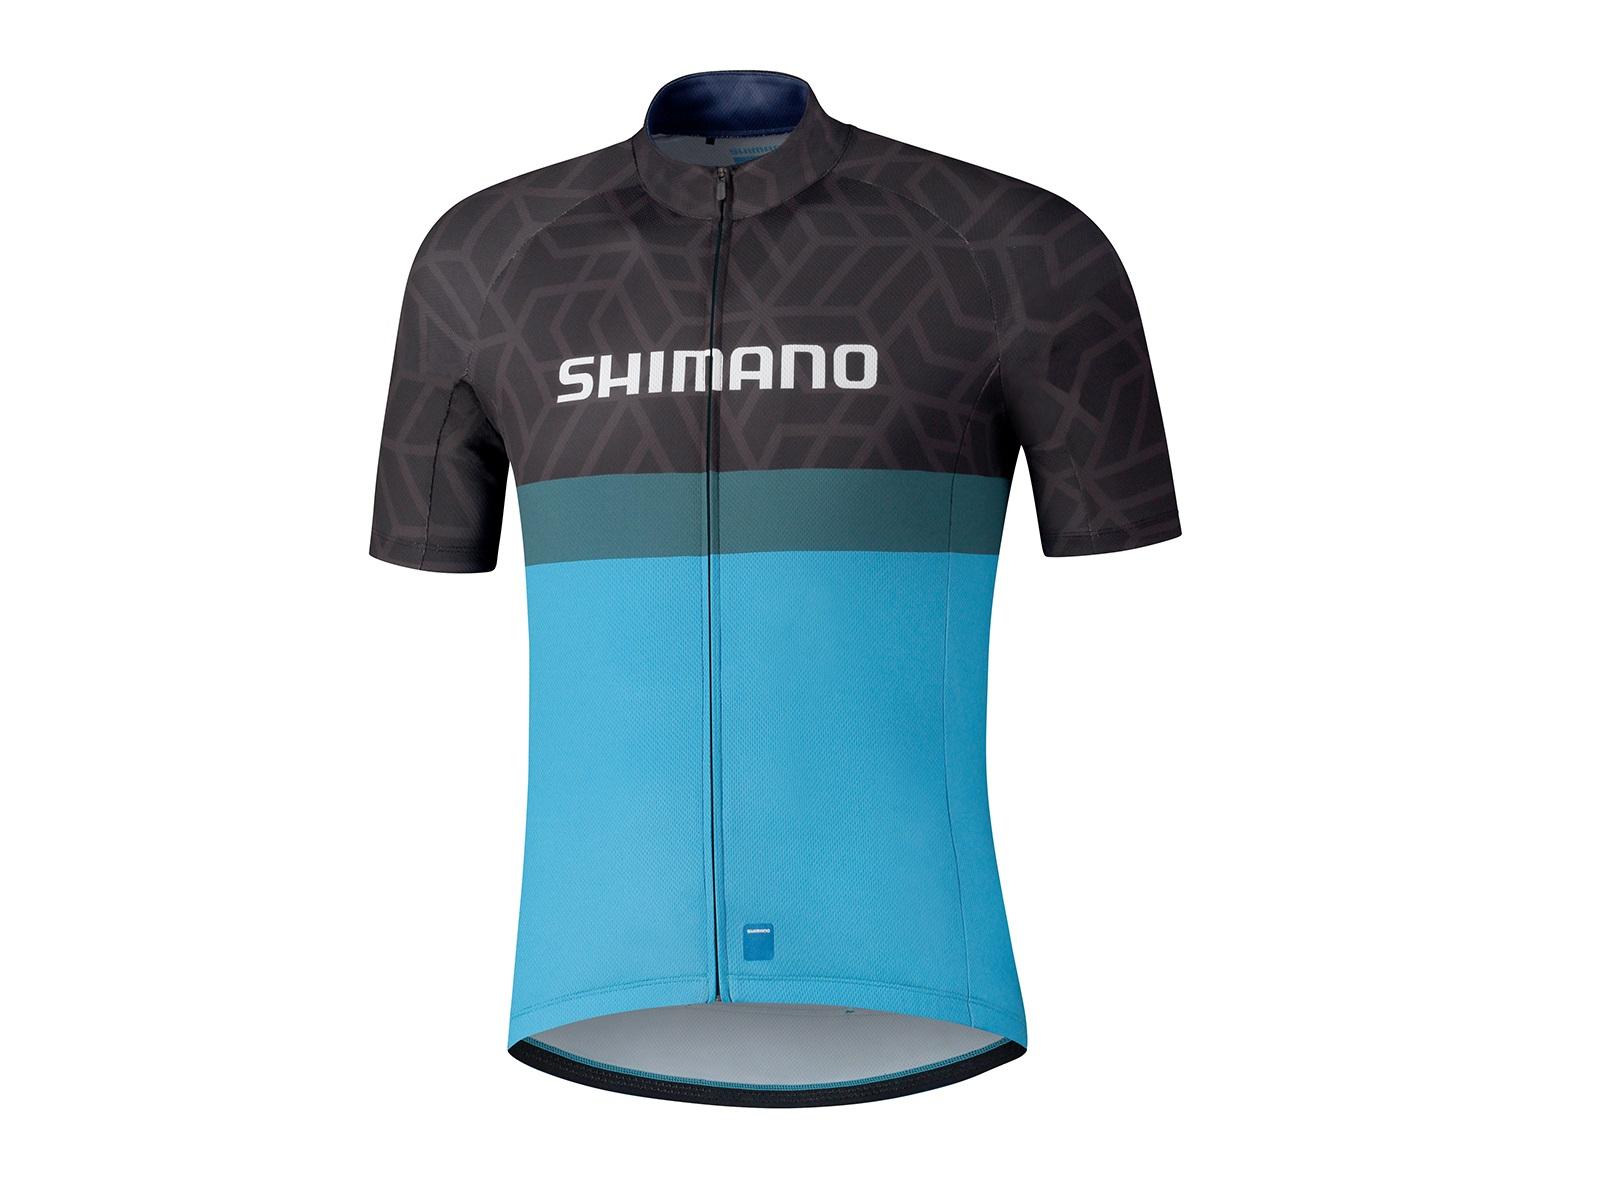 Shimano - Team | cykeltrøje